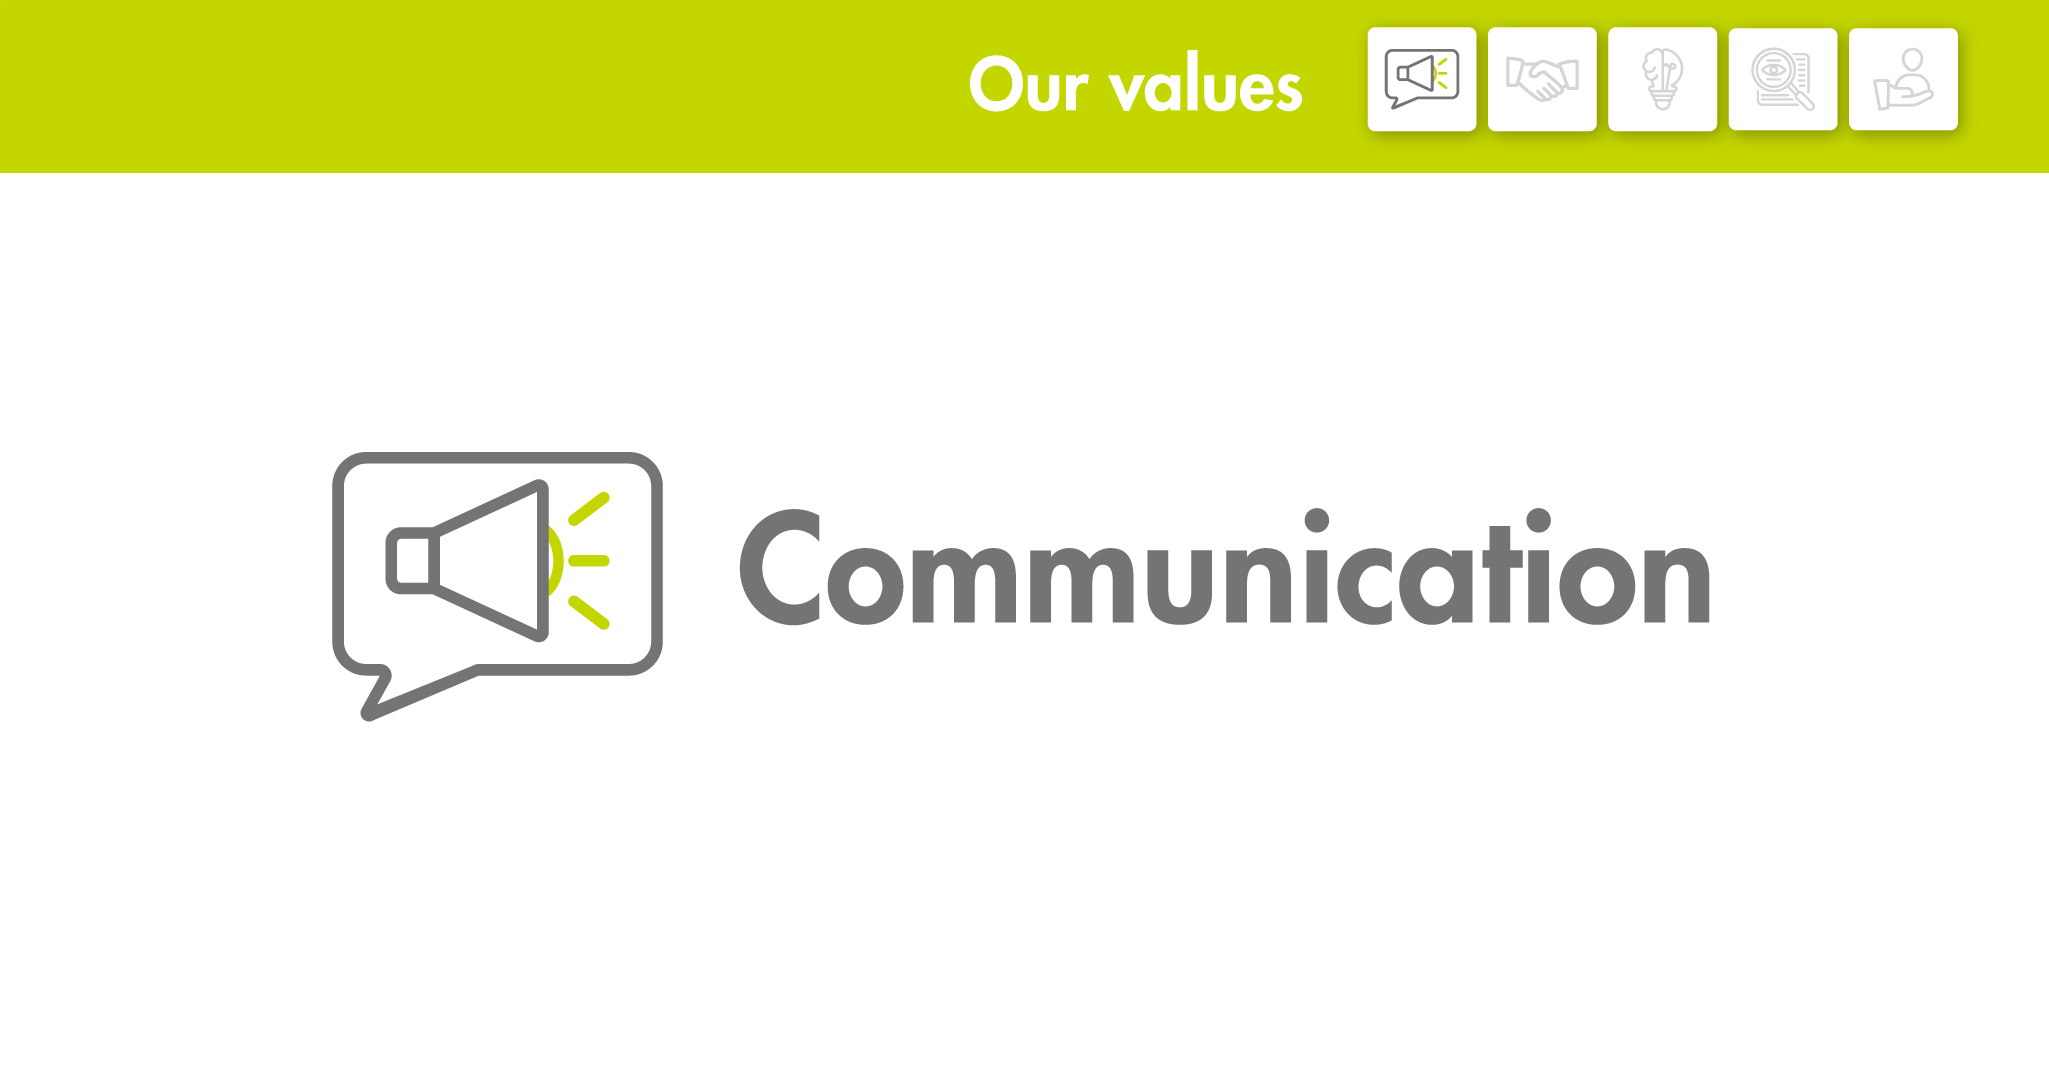 Our values: Comunication